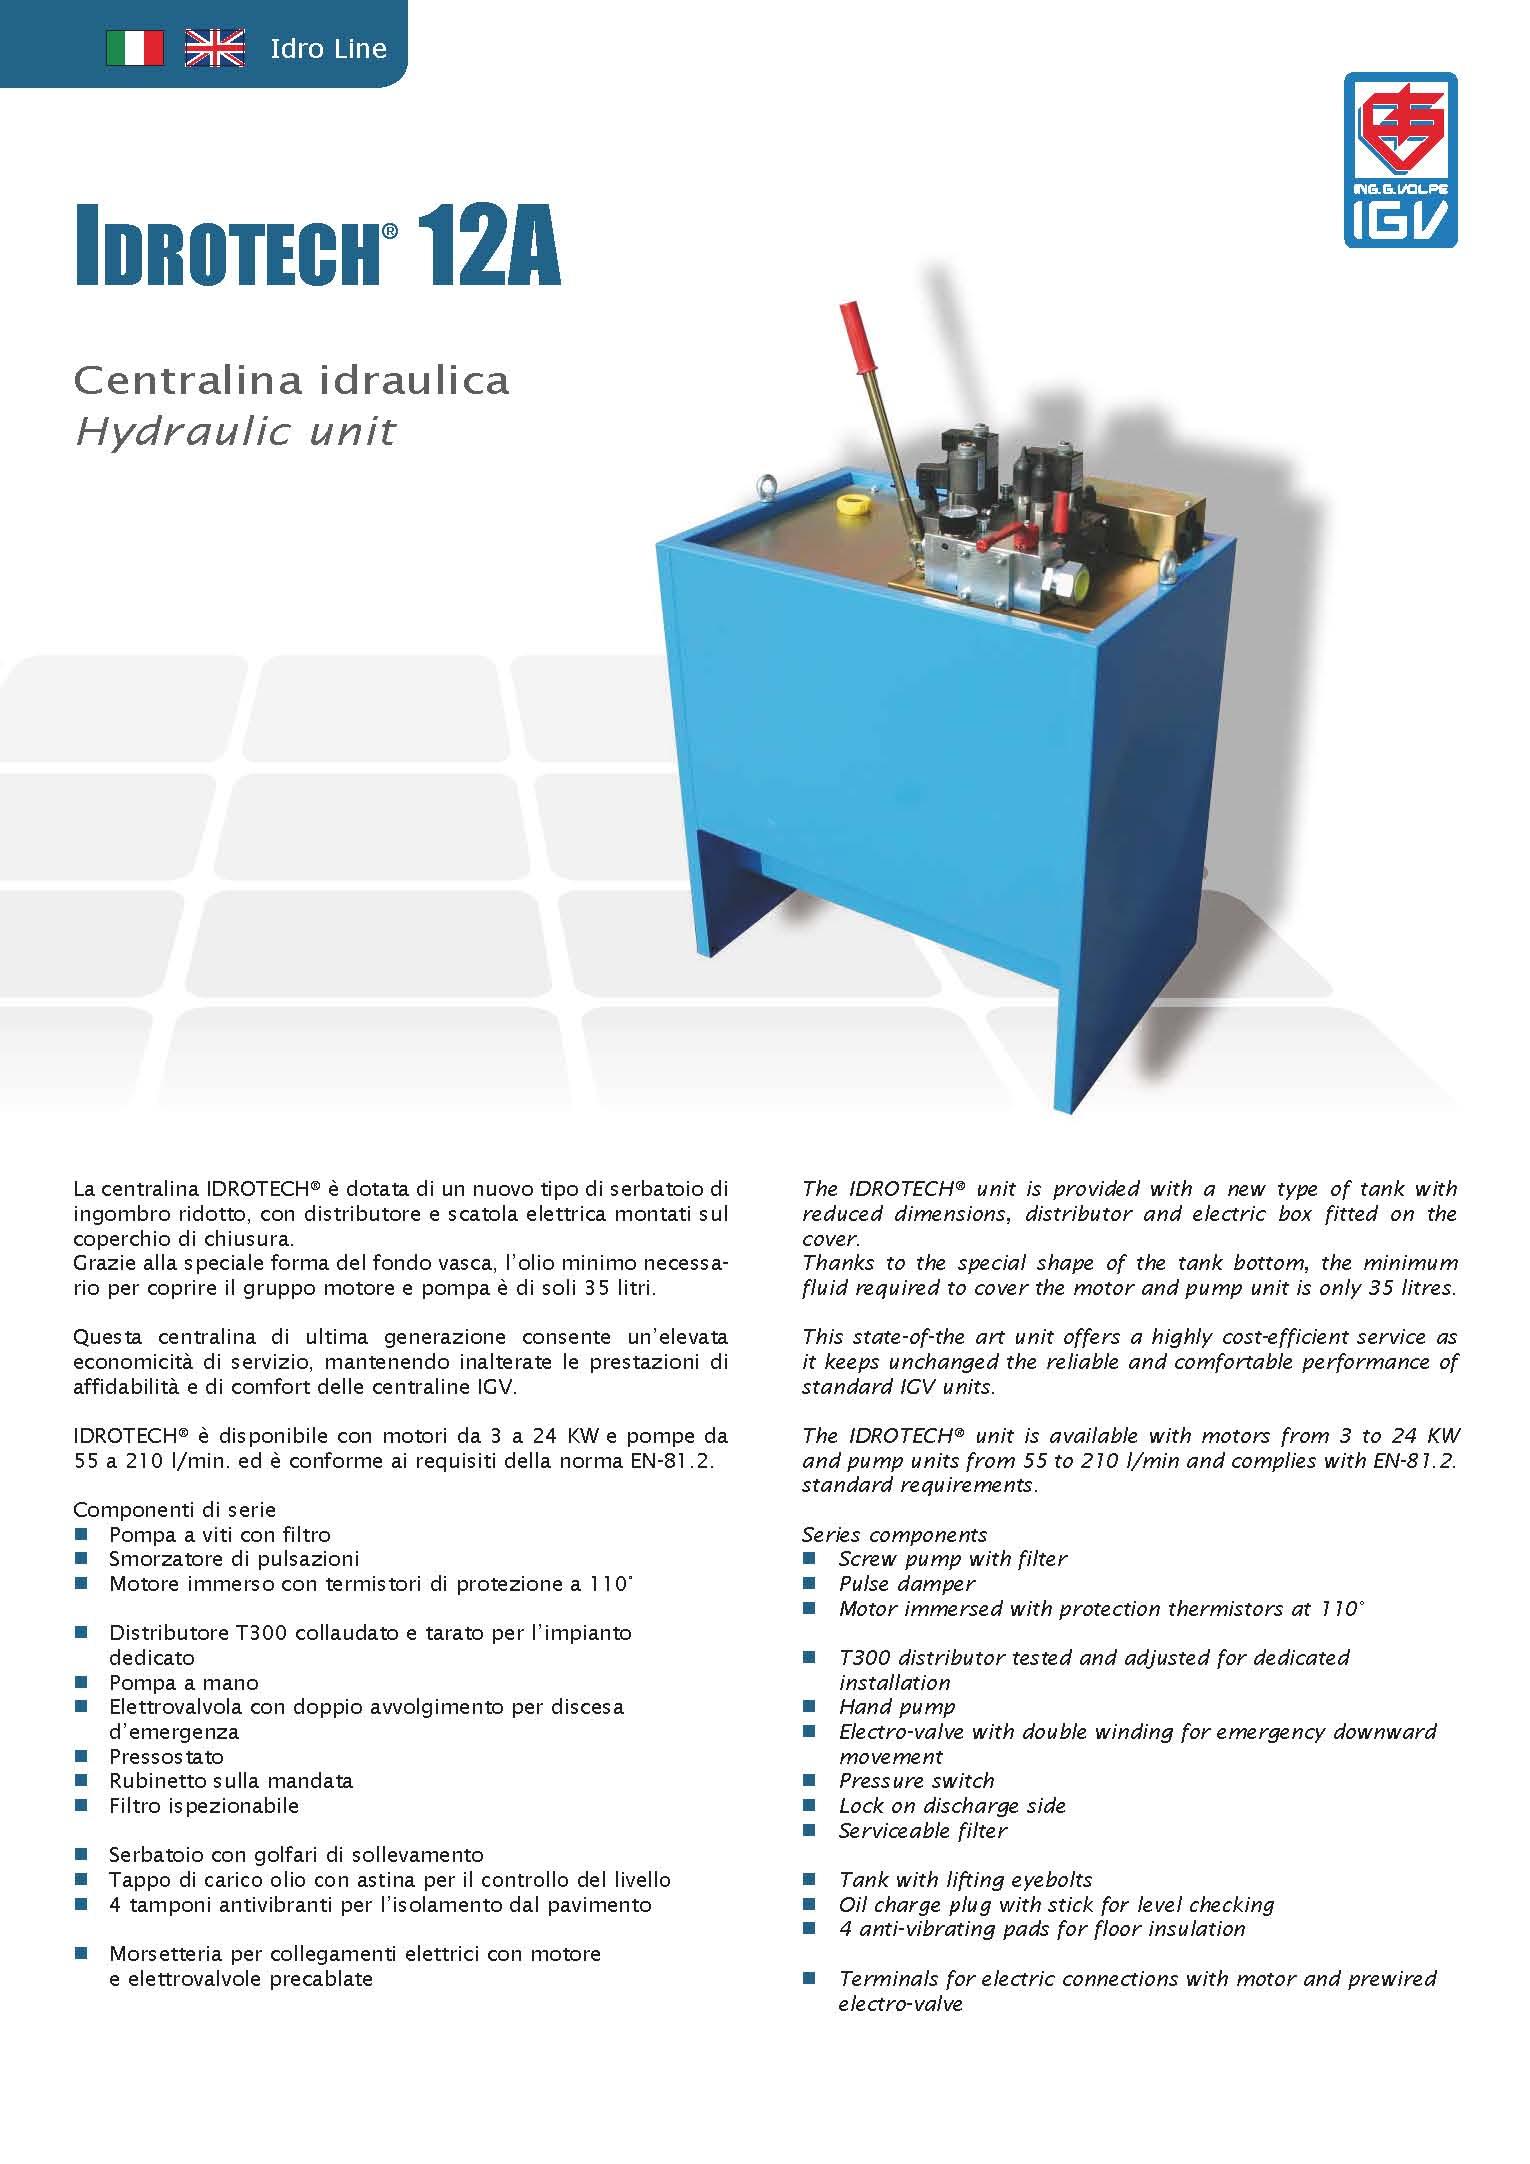 IGV-Idrotech-12A_Pagina_1